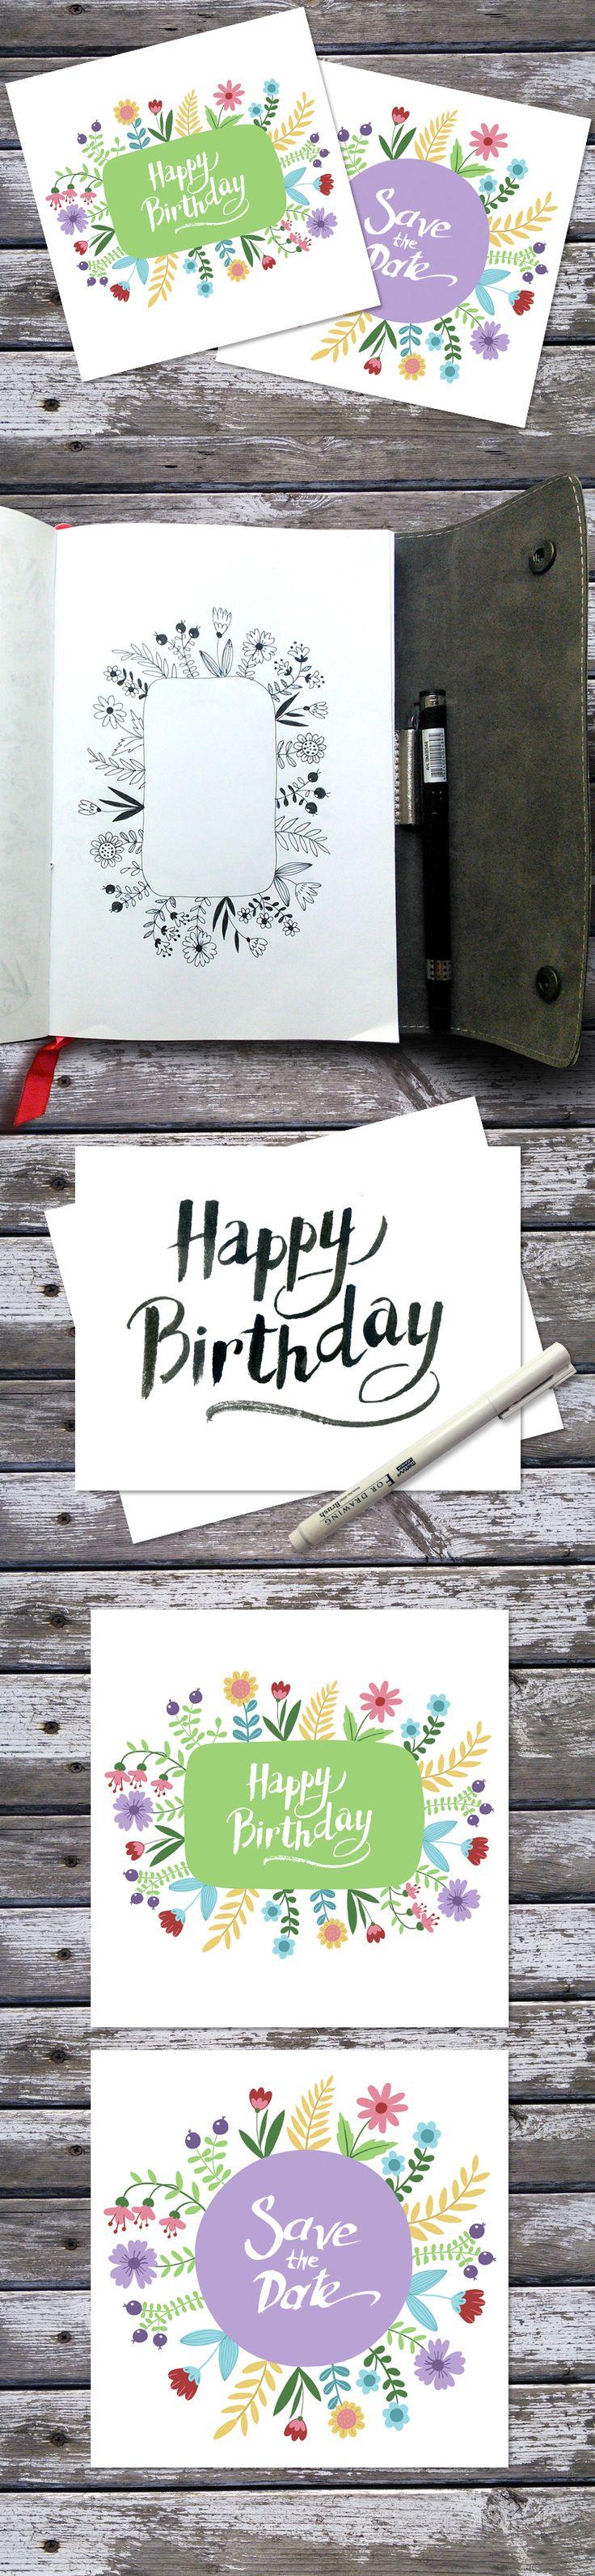 free printable funny0th birthday invitations%0A Happy Birthday invitation card on Behance